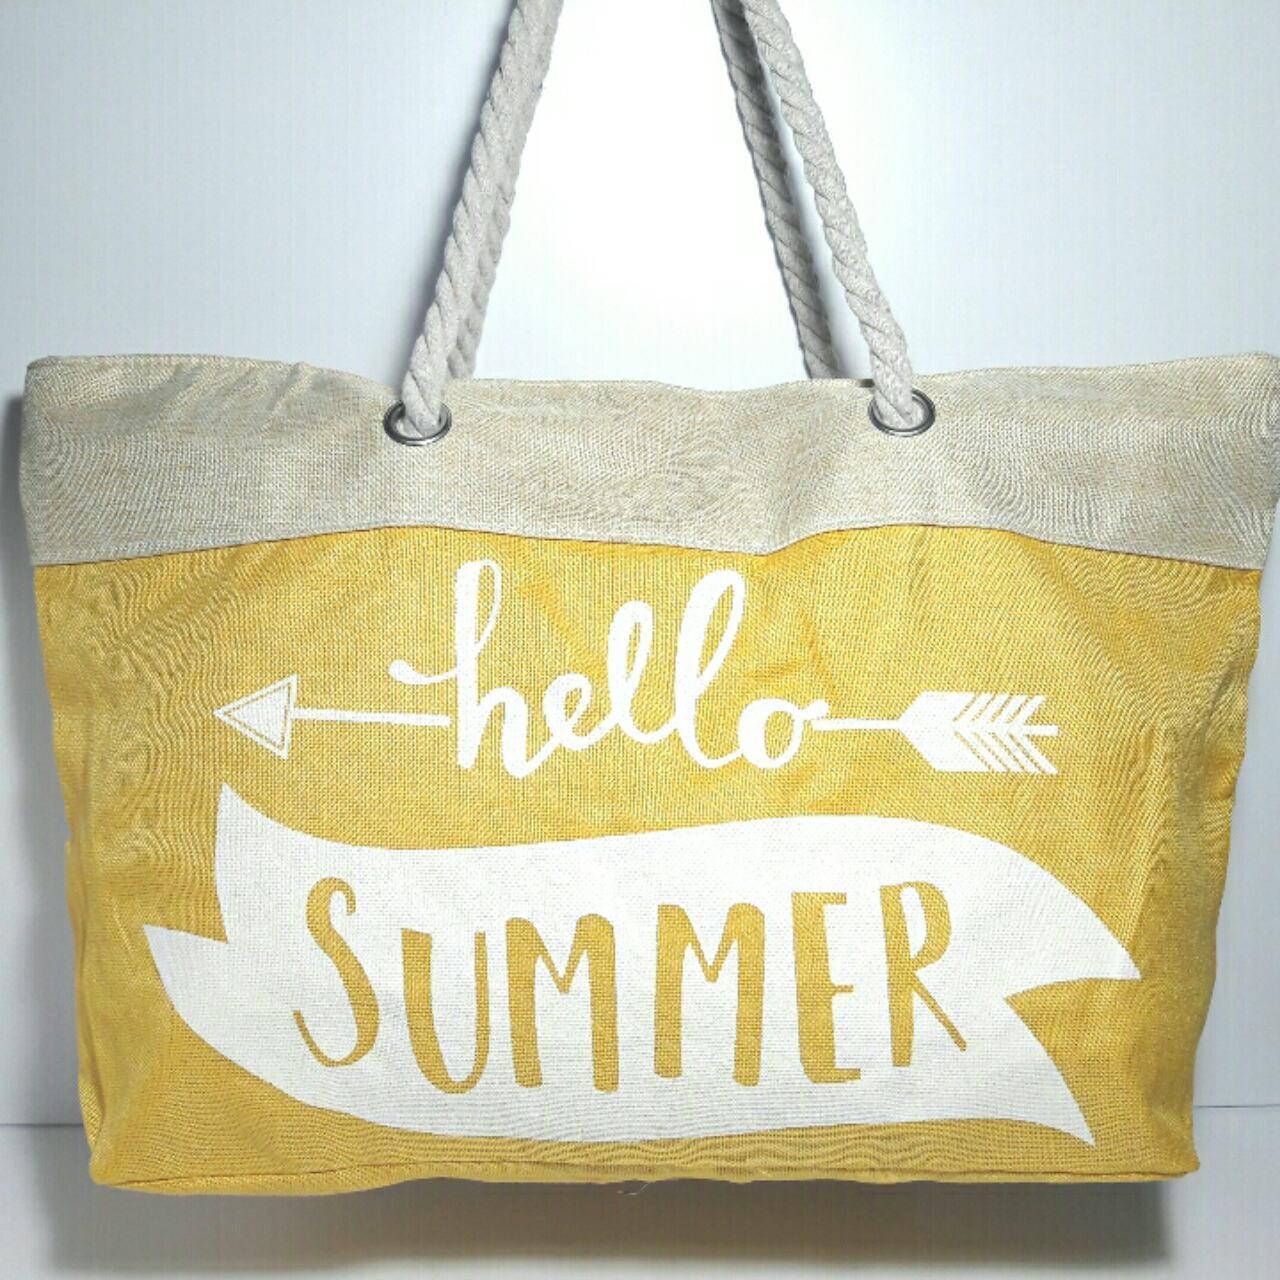 Сумка пляжная летняя текстильная Summer